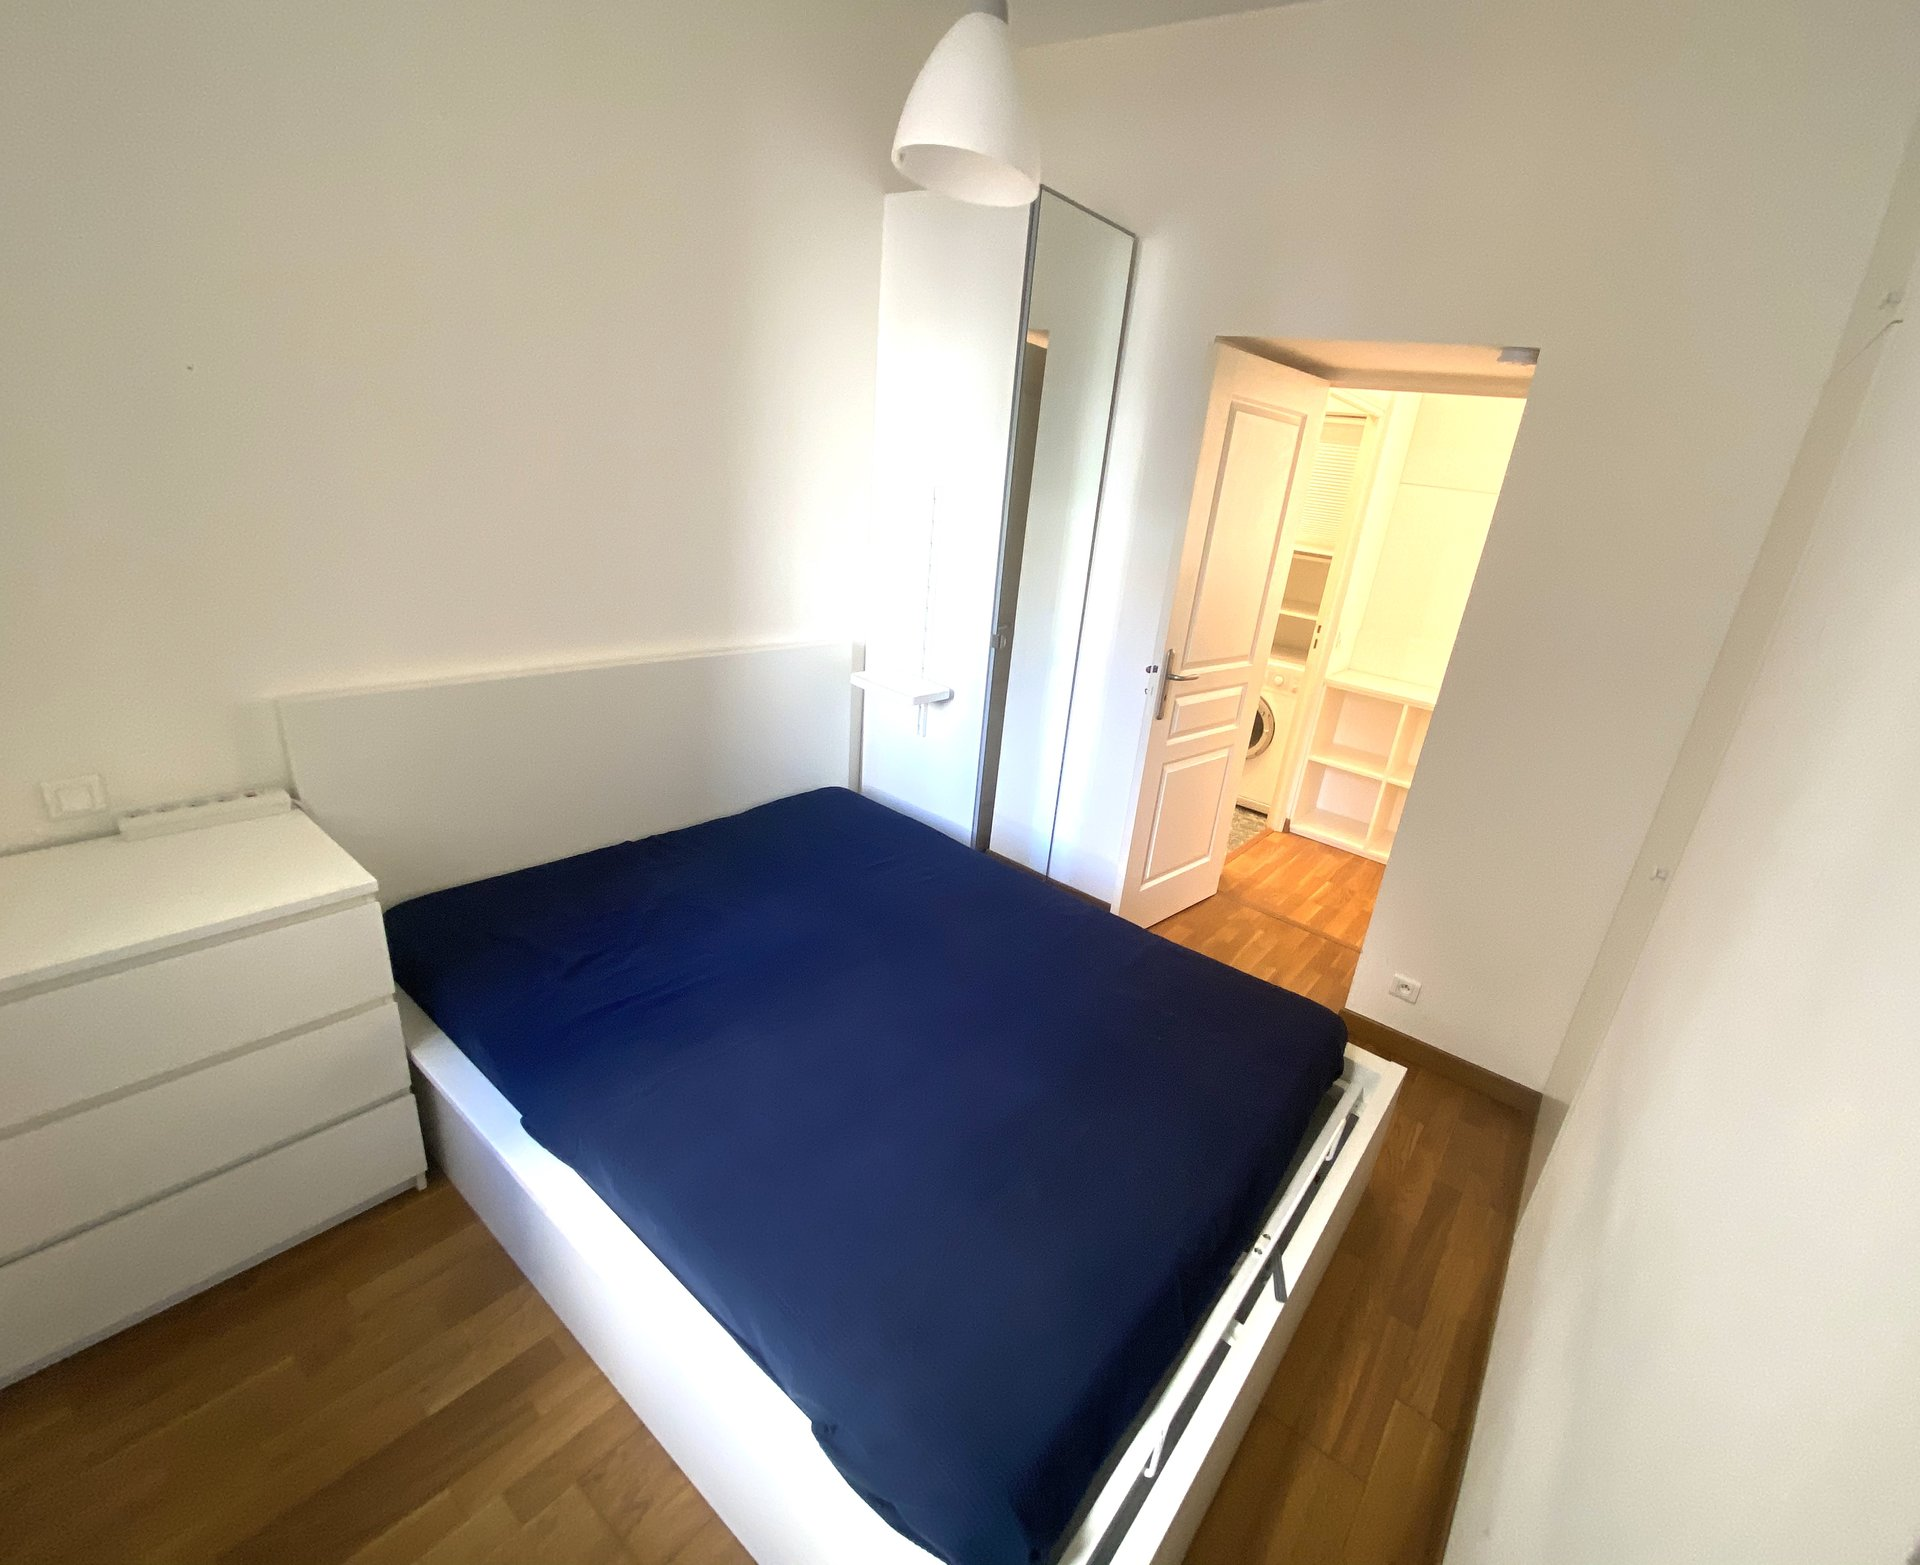 ONE BEDROOM APARTEMENT CENTER OF NICE